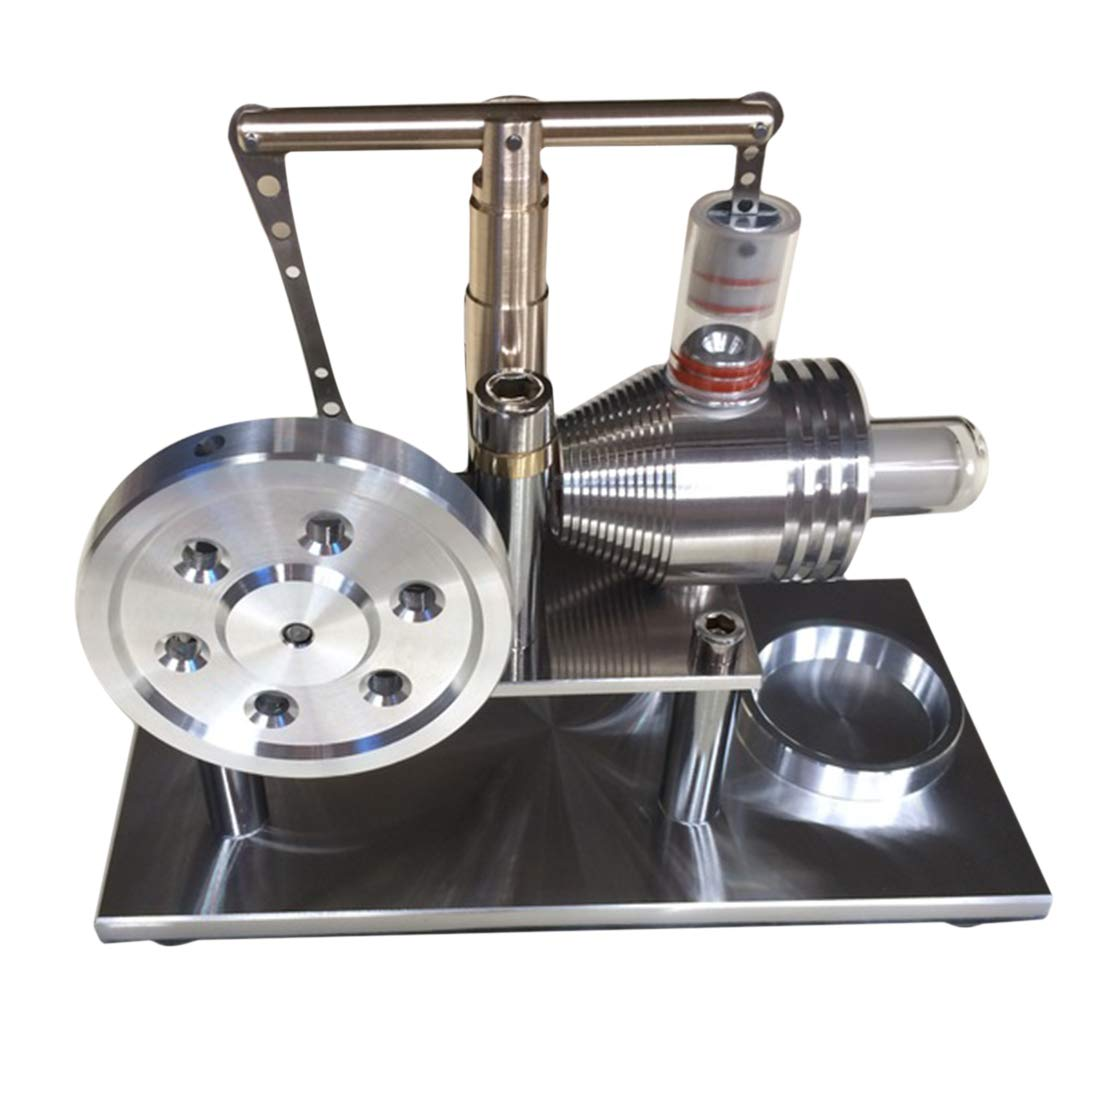 LDB SHOP DIY Dampf Gleichgewicht Stirlingmotor Engine Education Modell STEM Spielzeug